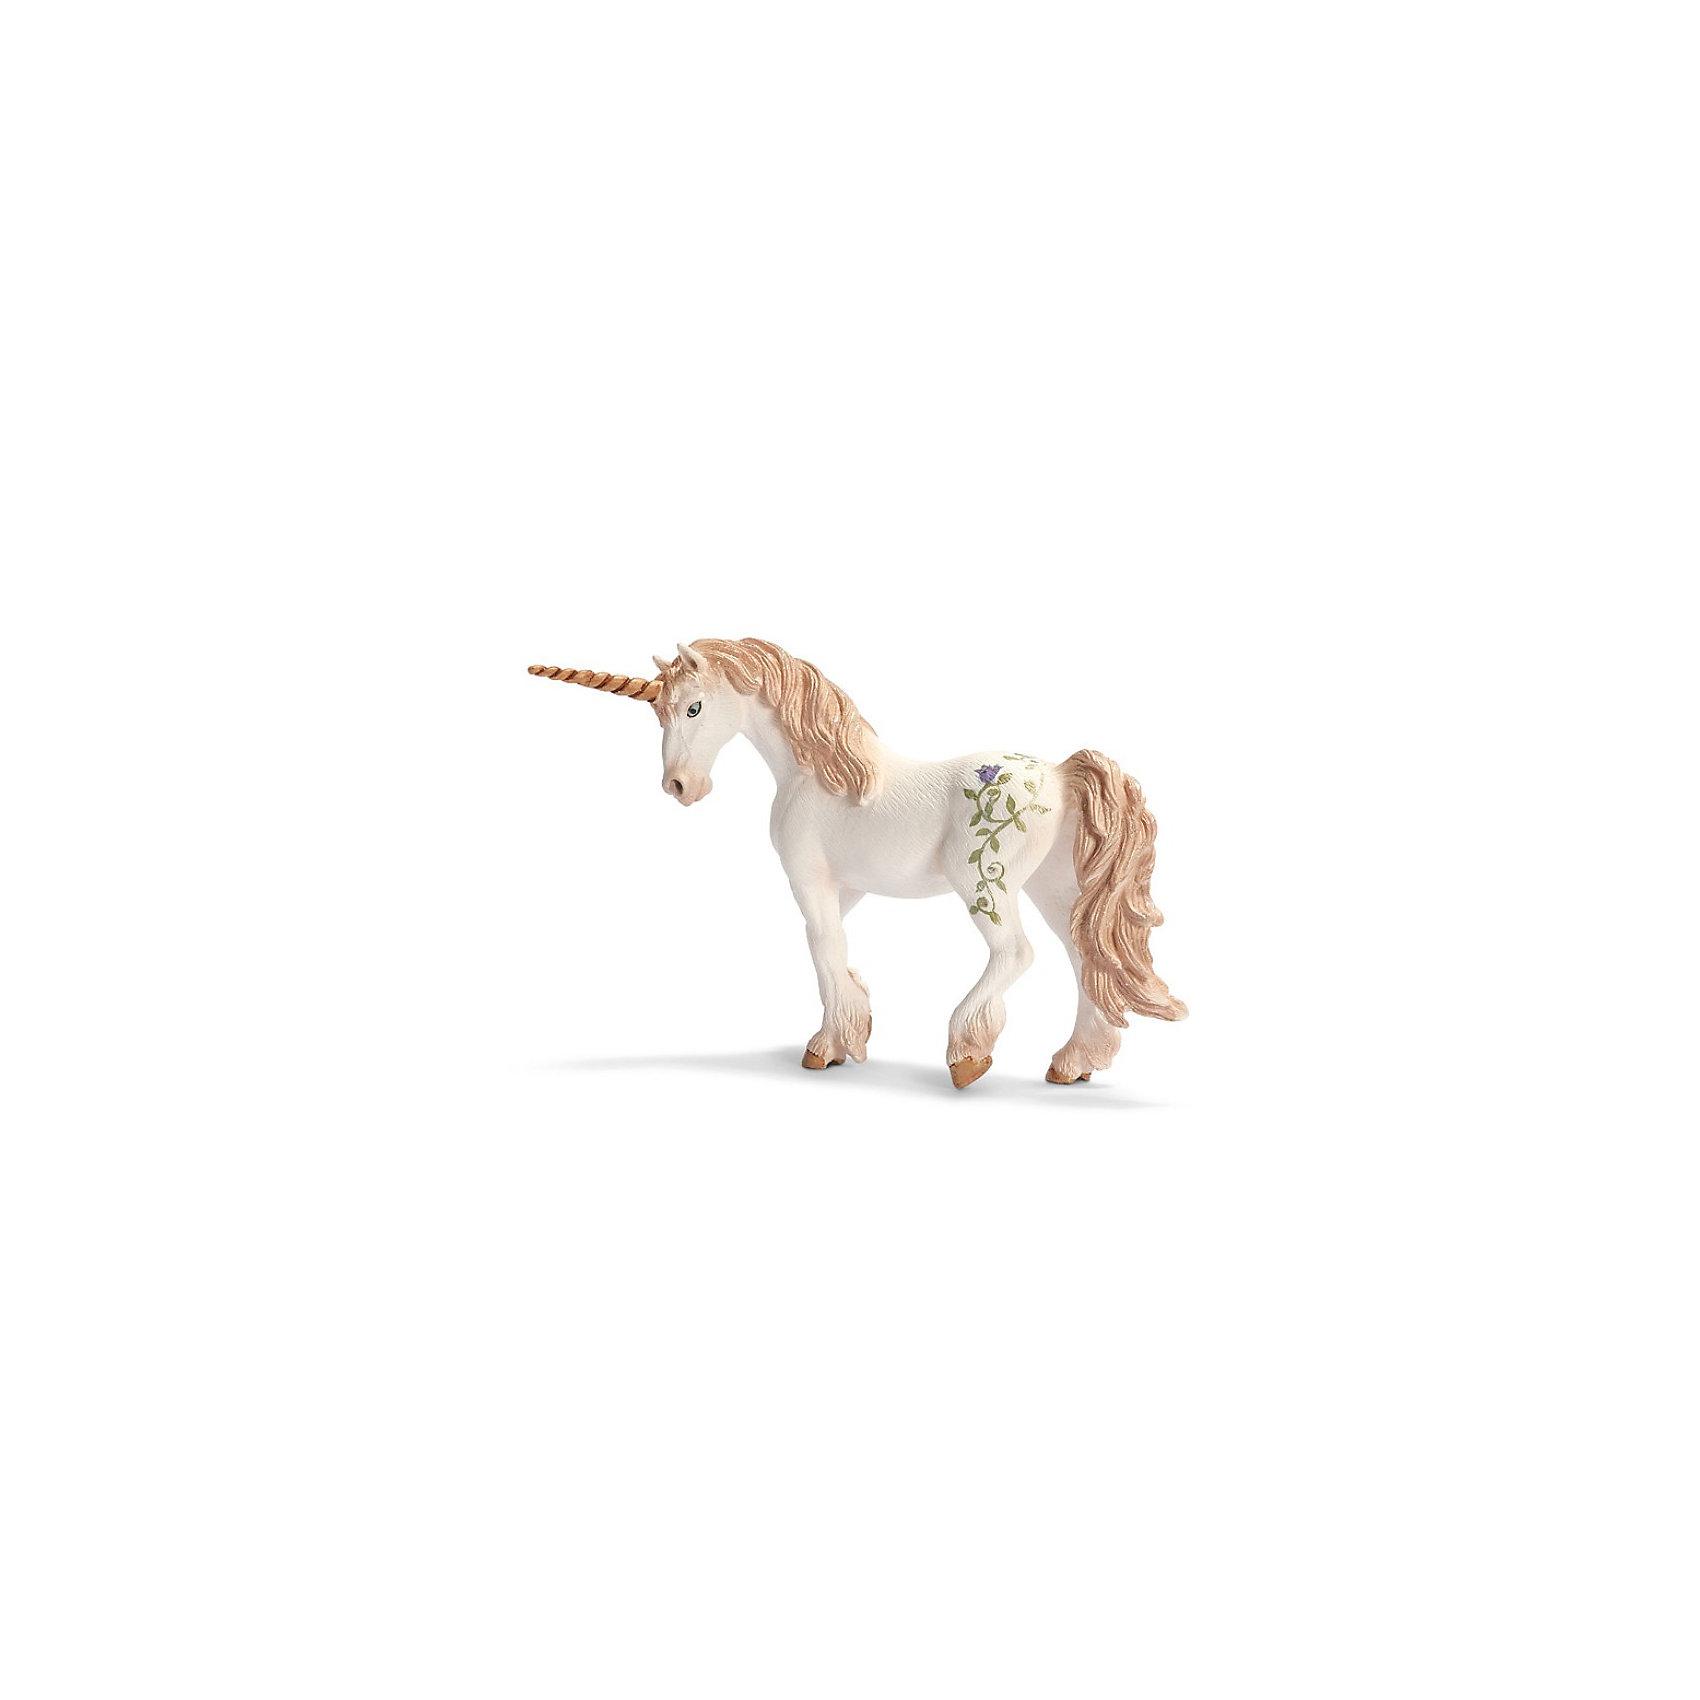 Schleich Schleich Единорог. Серия Эльфы видеодиски нд плэй экстрасенсы dvd video dvd box